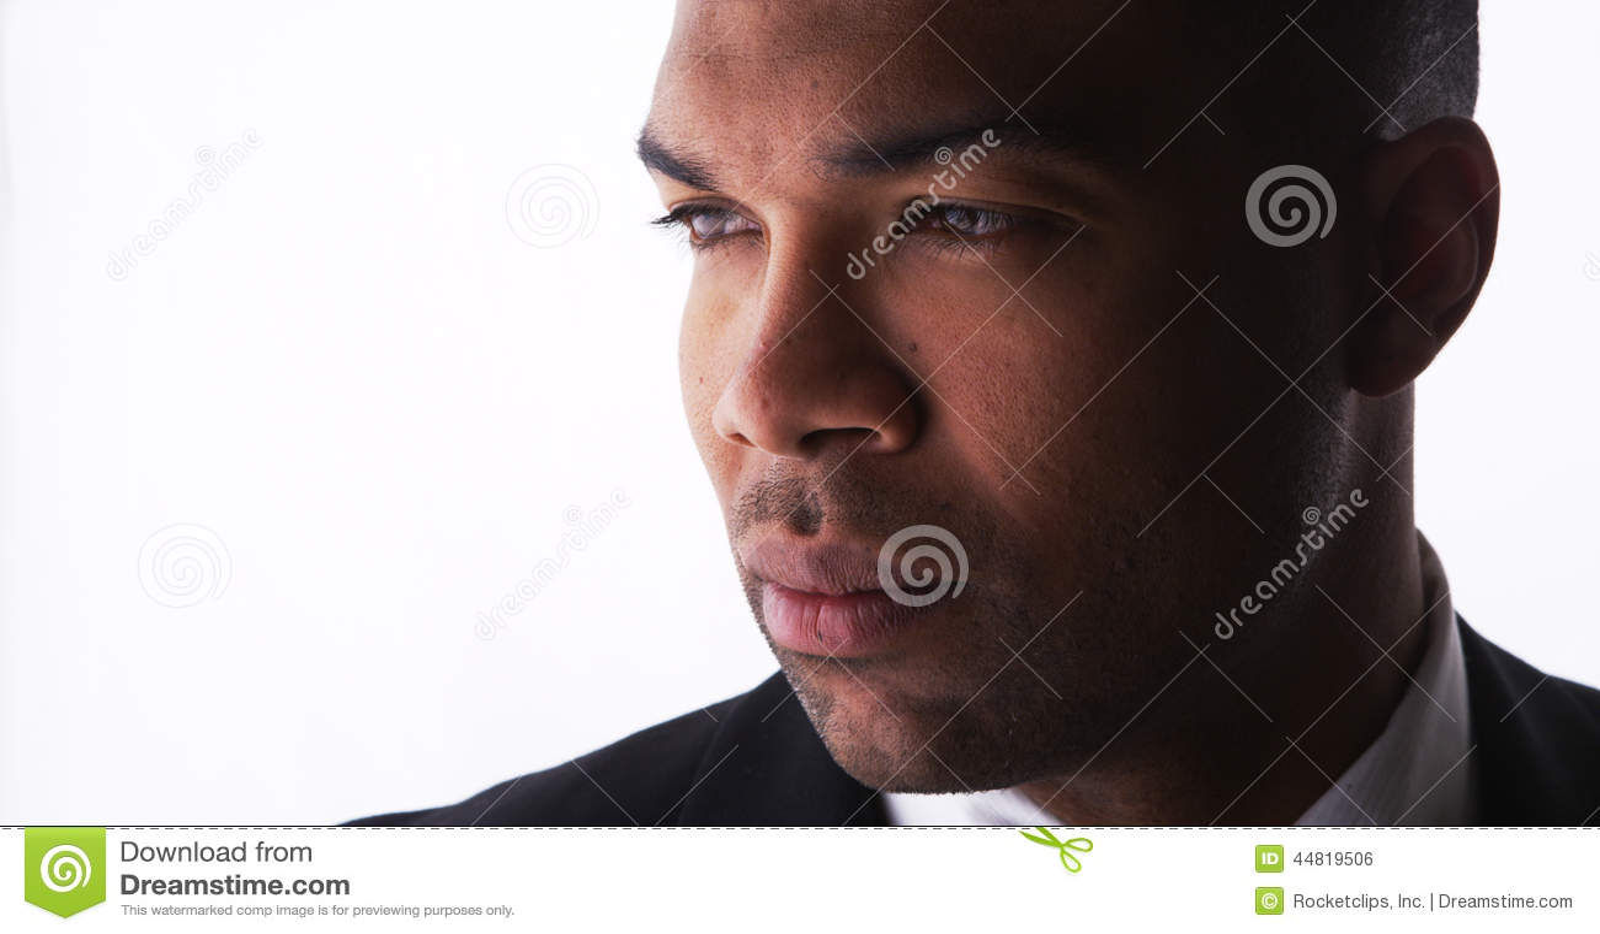 Man profile pic